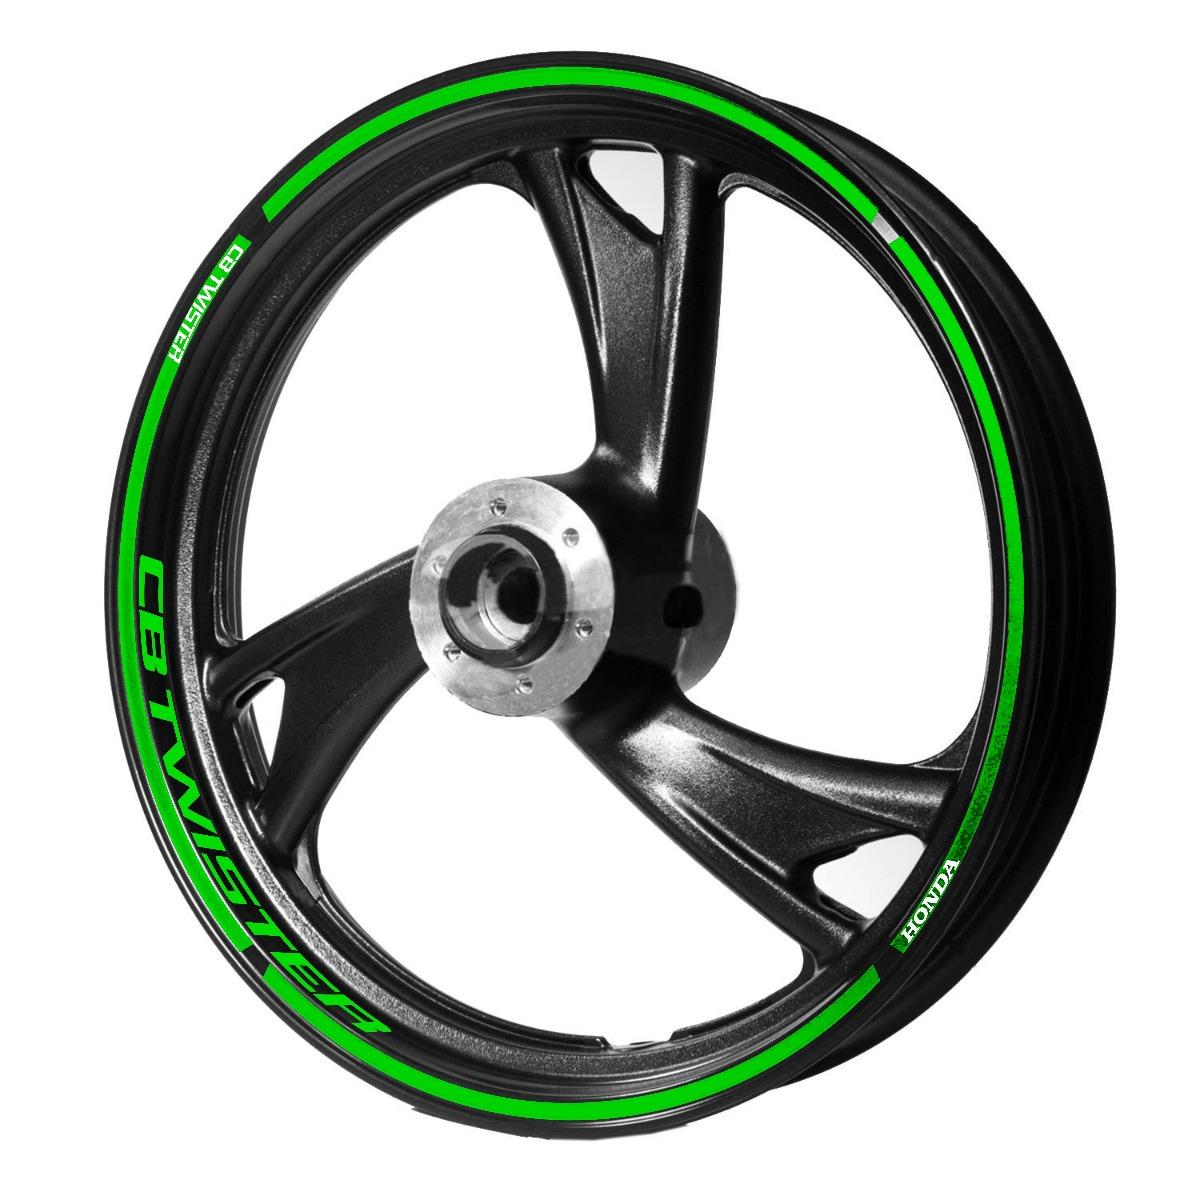 4aba2effc81 adesivo friso/logo roda honda cb 250 twister verde refletivo. Carregando  zoom.